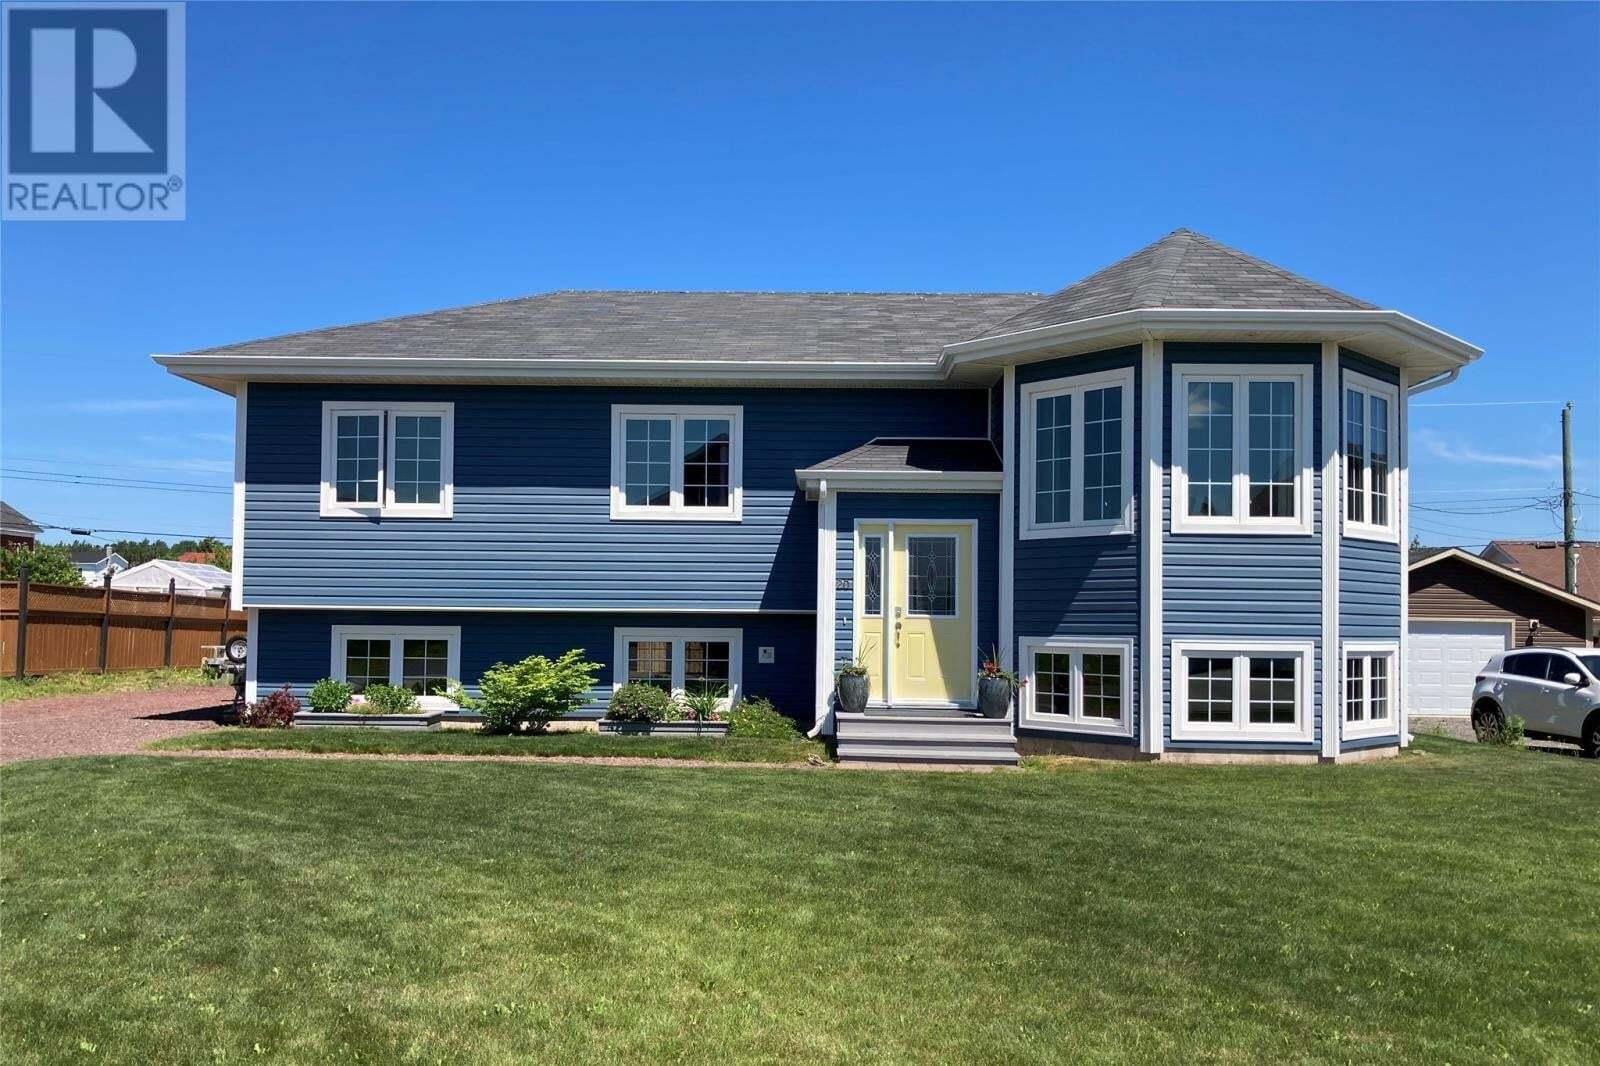 House for sale at 20 Evergreen Blvd Lewisporte Newfoundland - MLS: 1216898